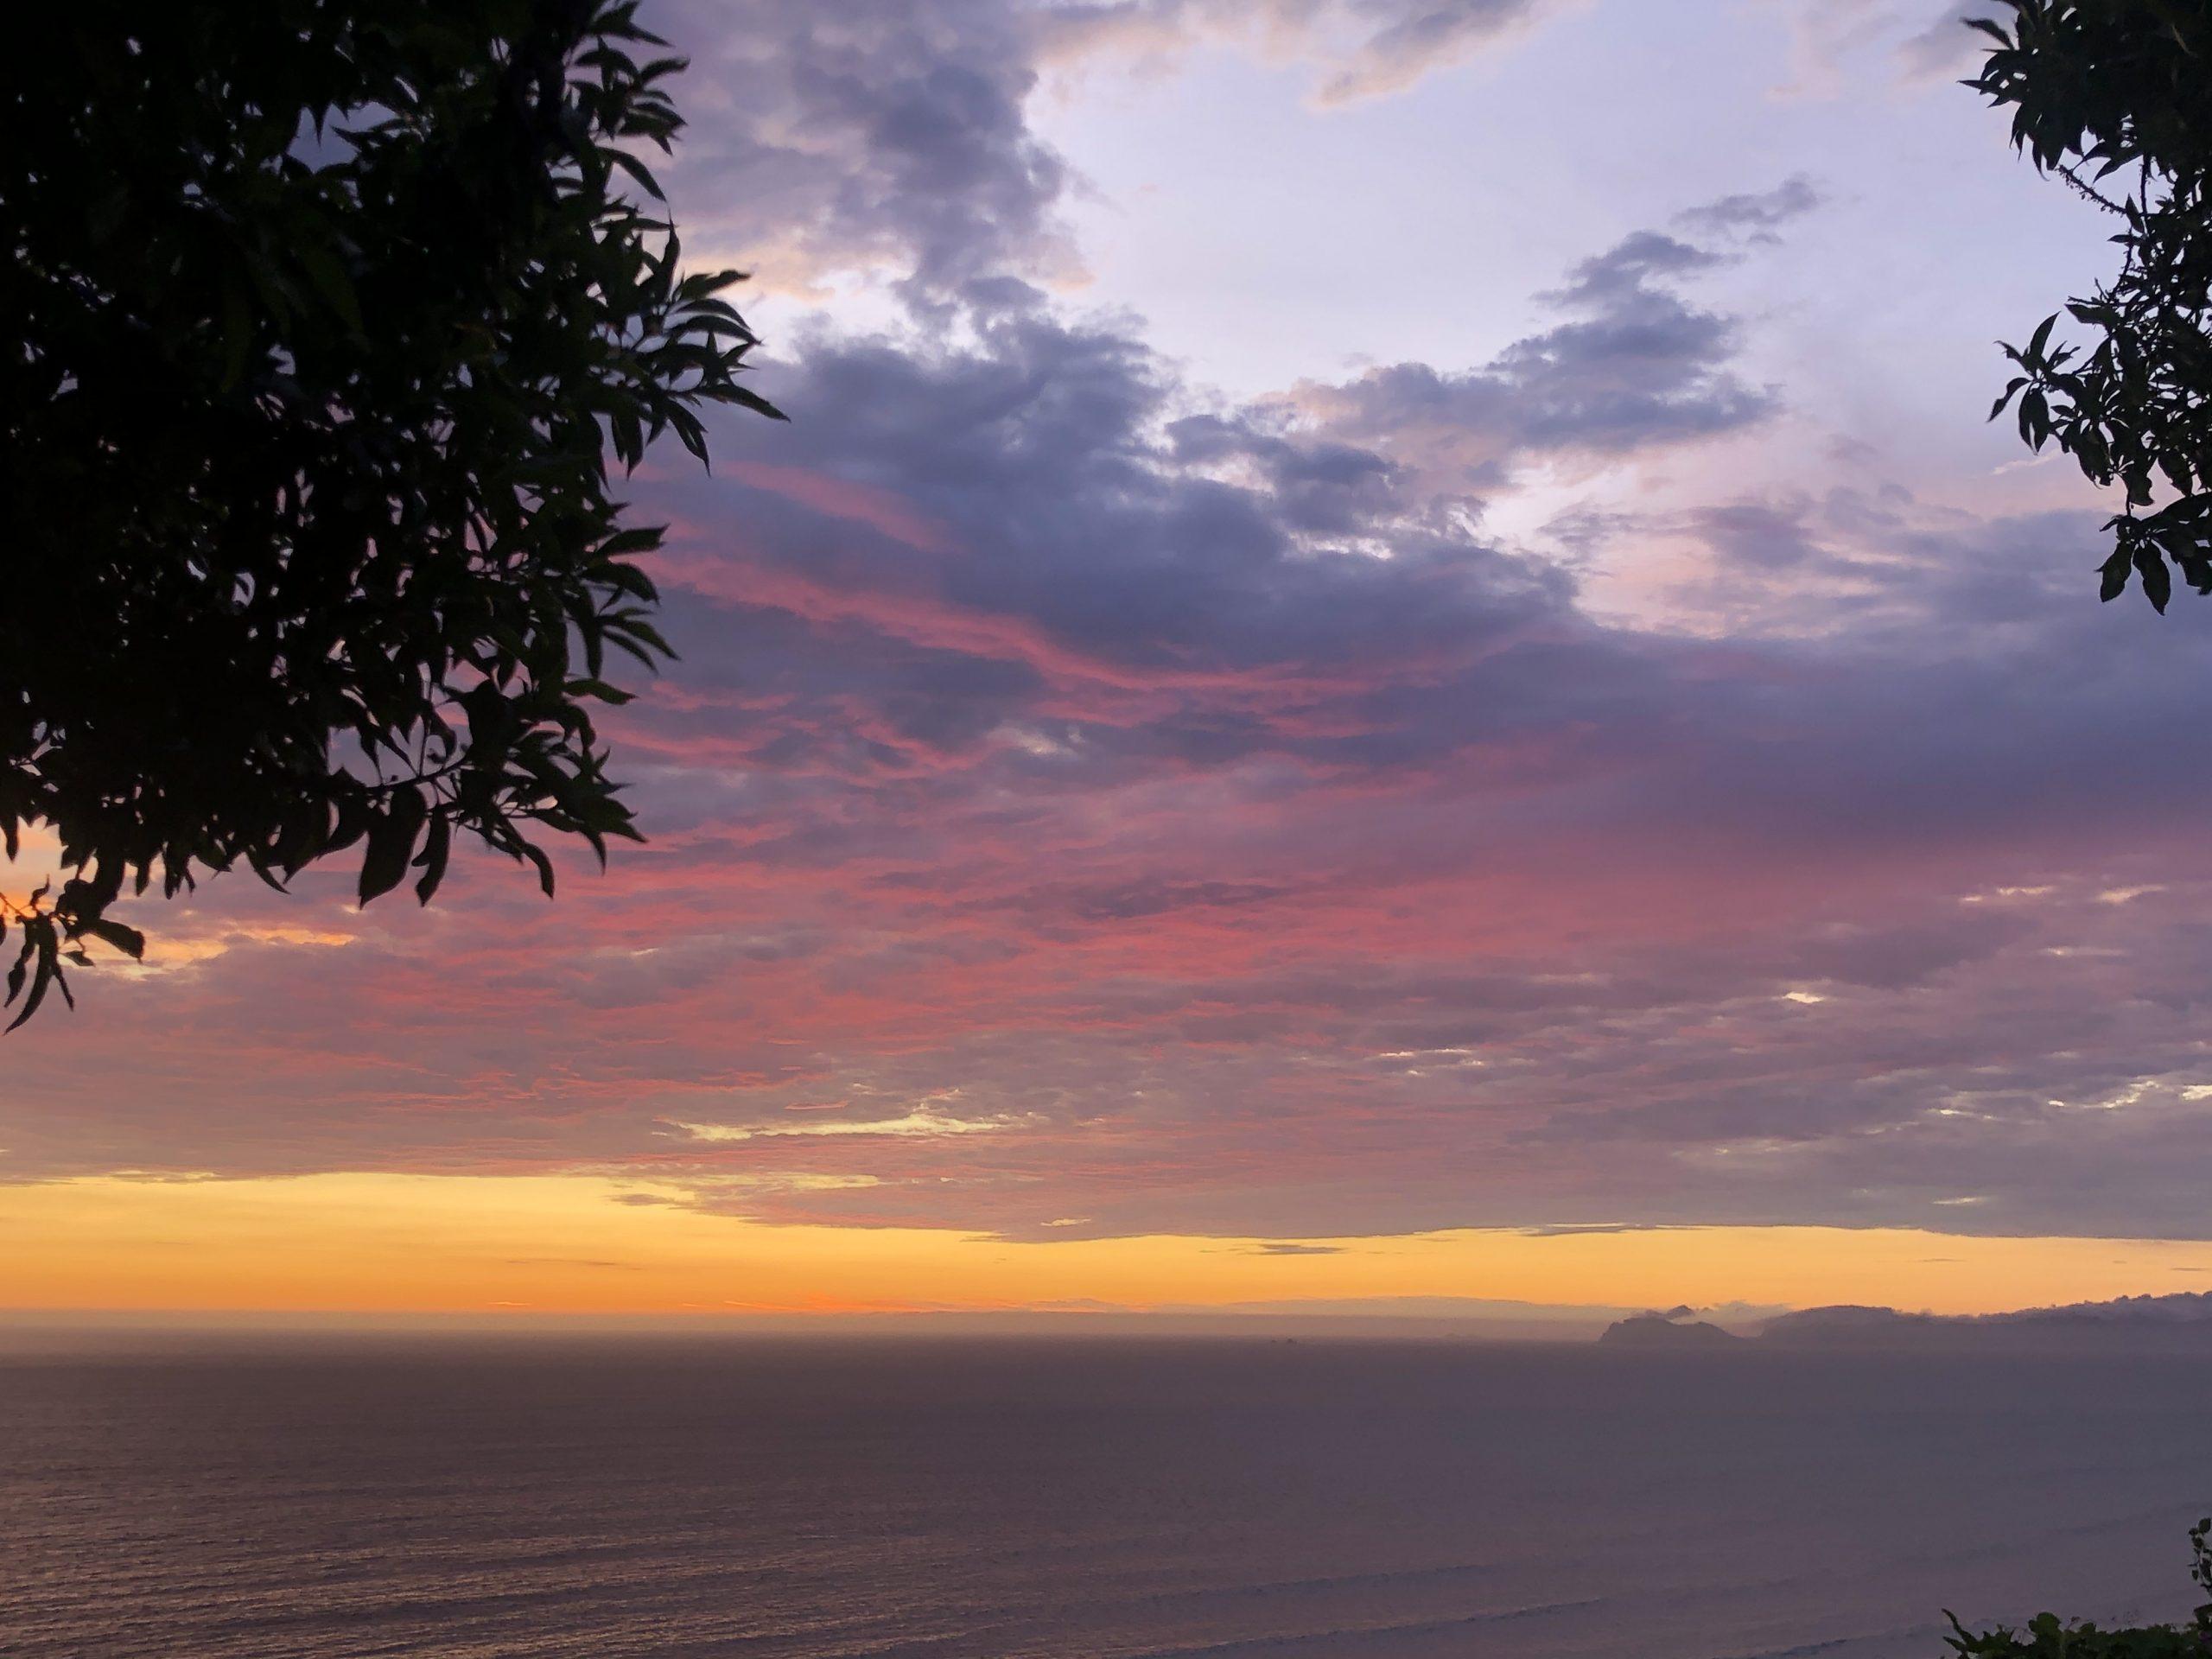 Sonnenuntergang über dem Meer.